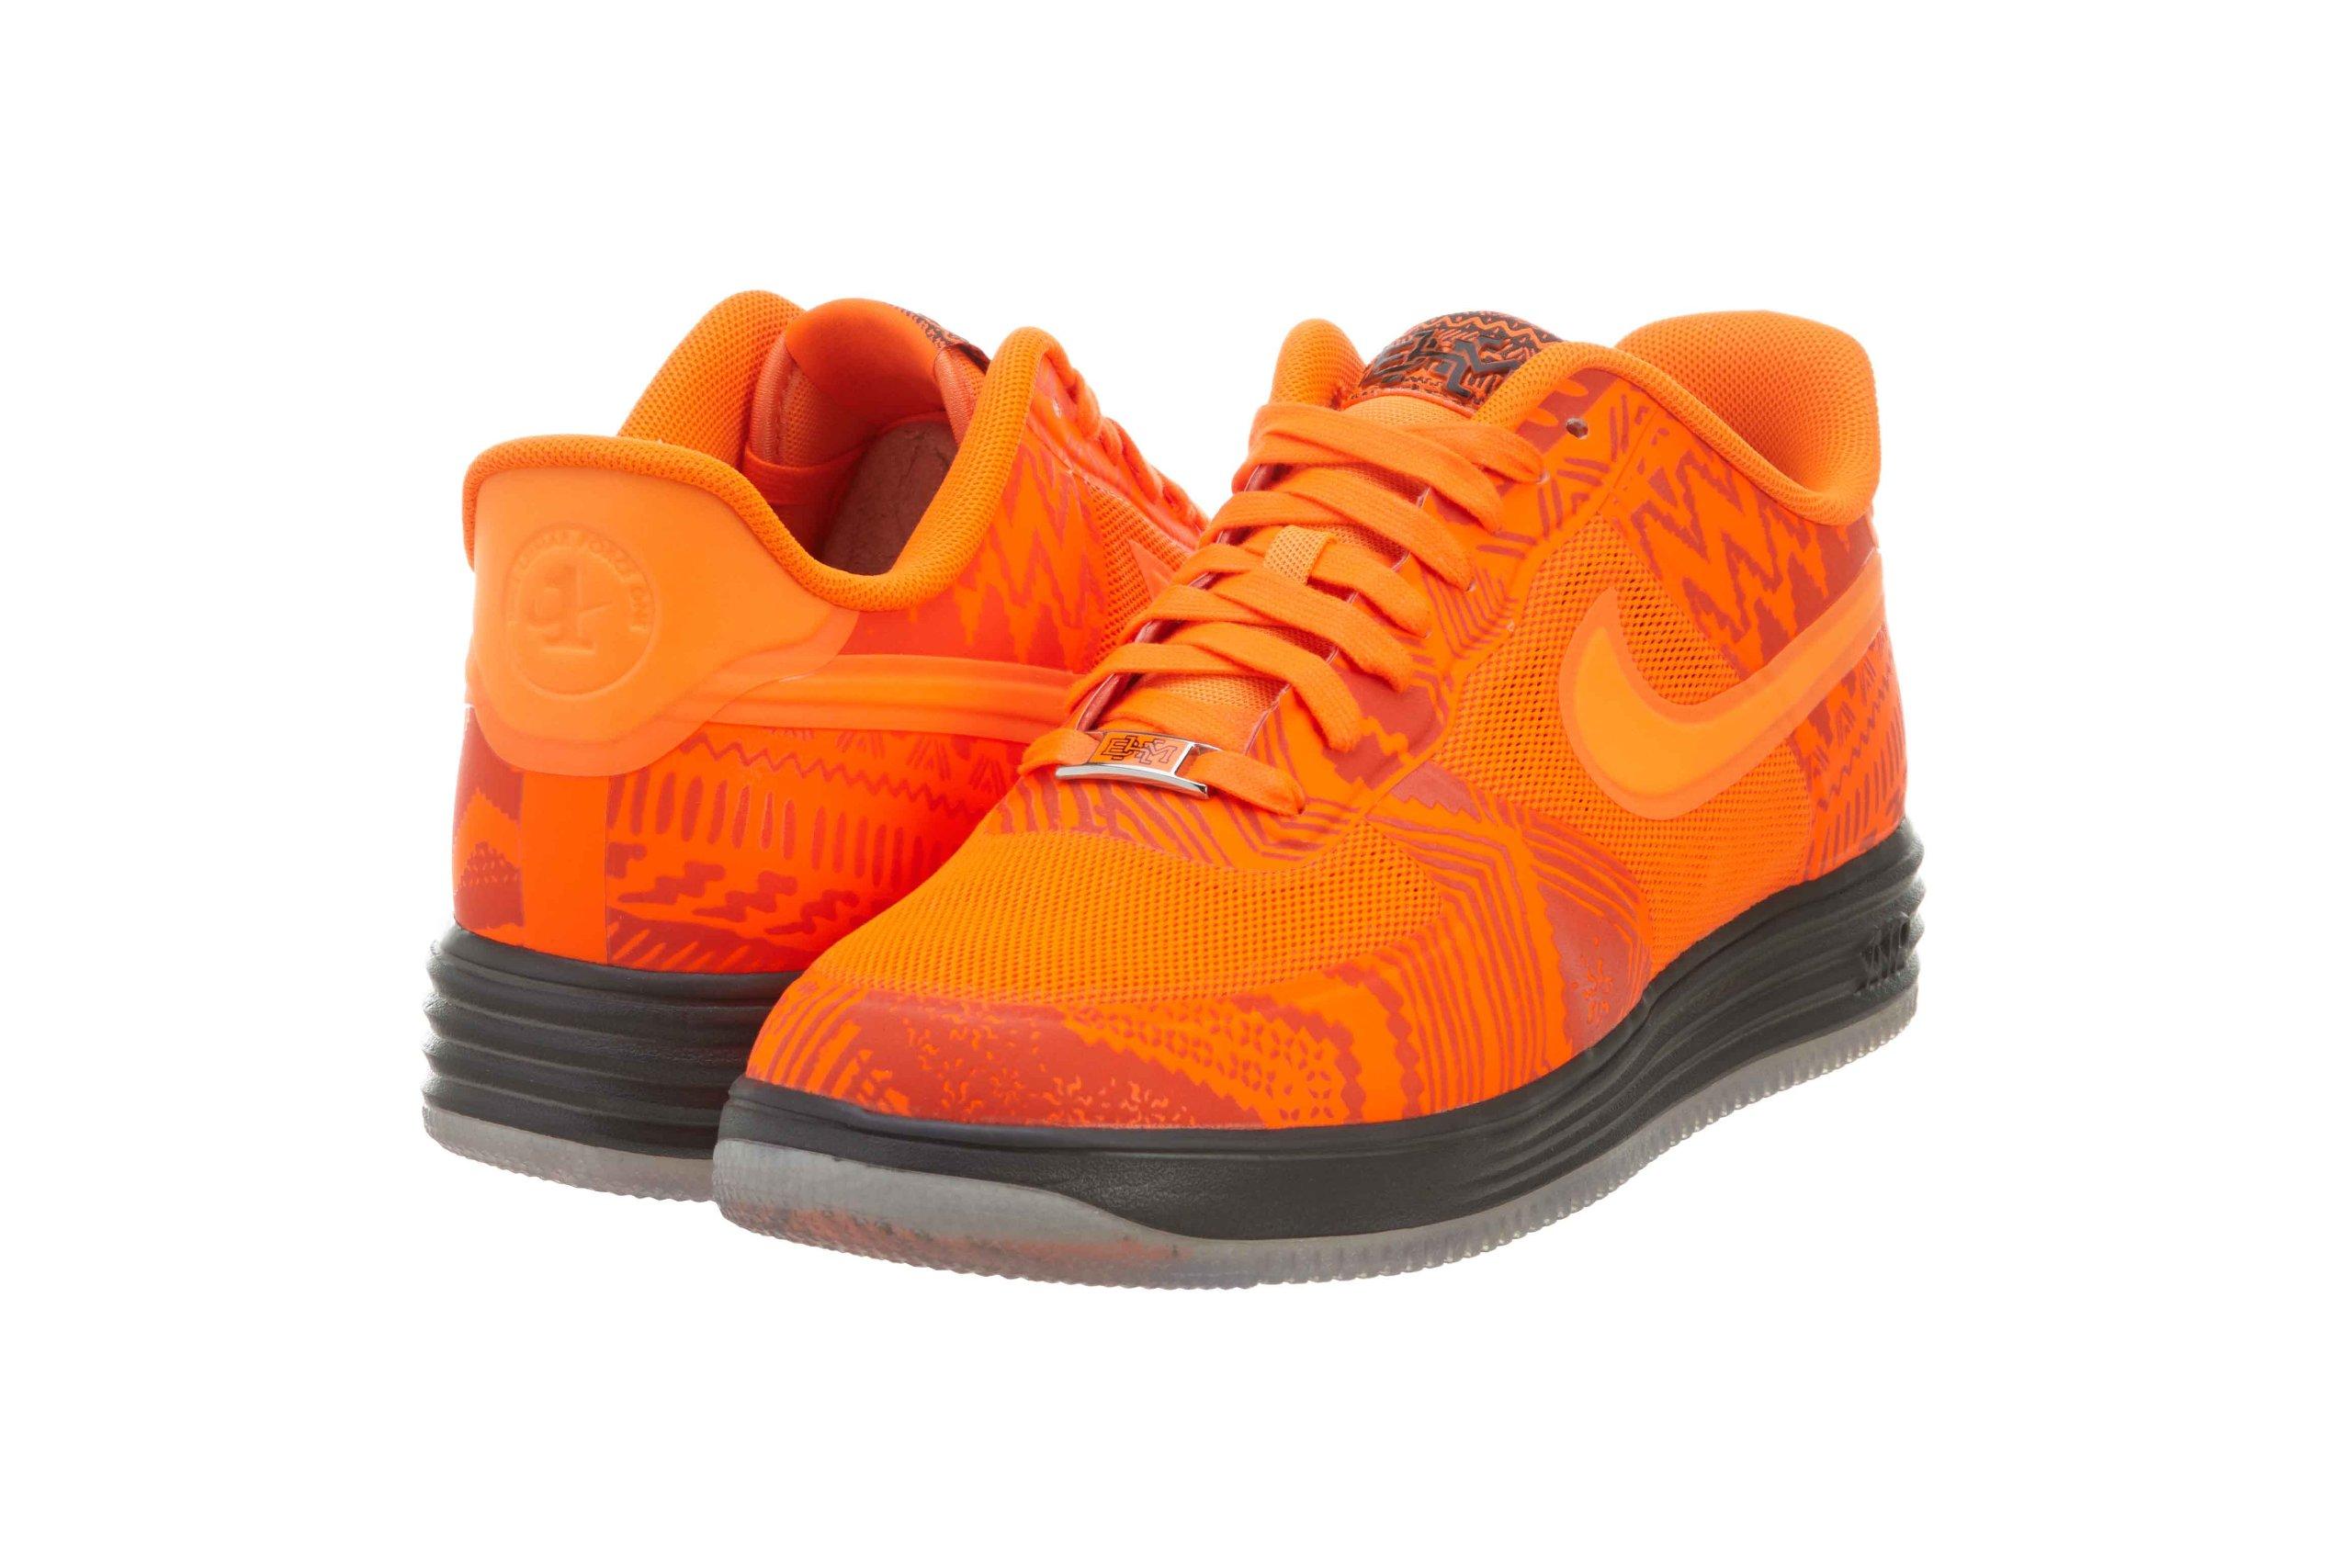 Nike Lunar Force 1 Fuse Bhm Sneaker Mens